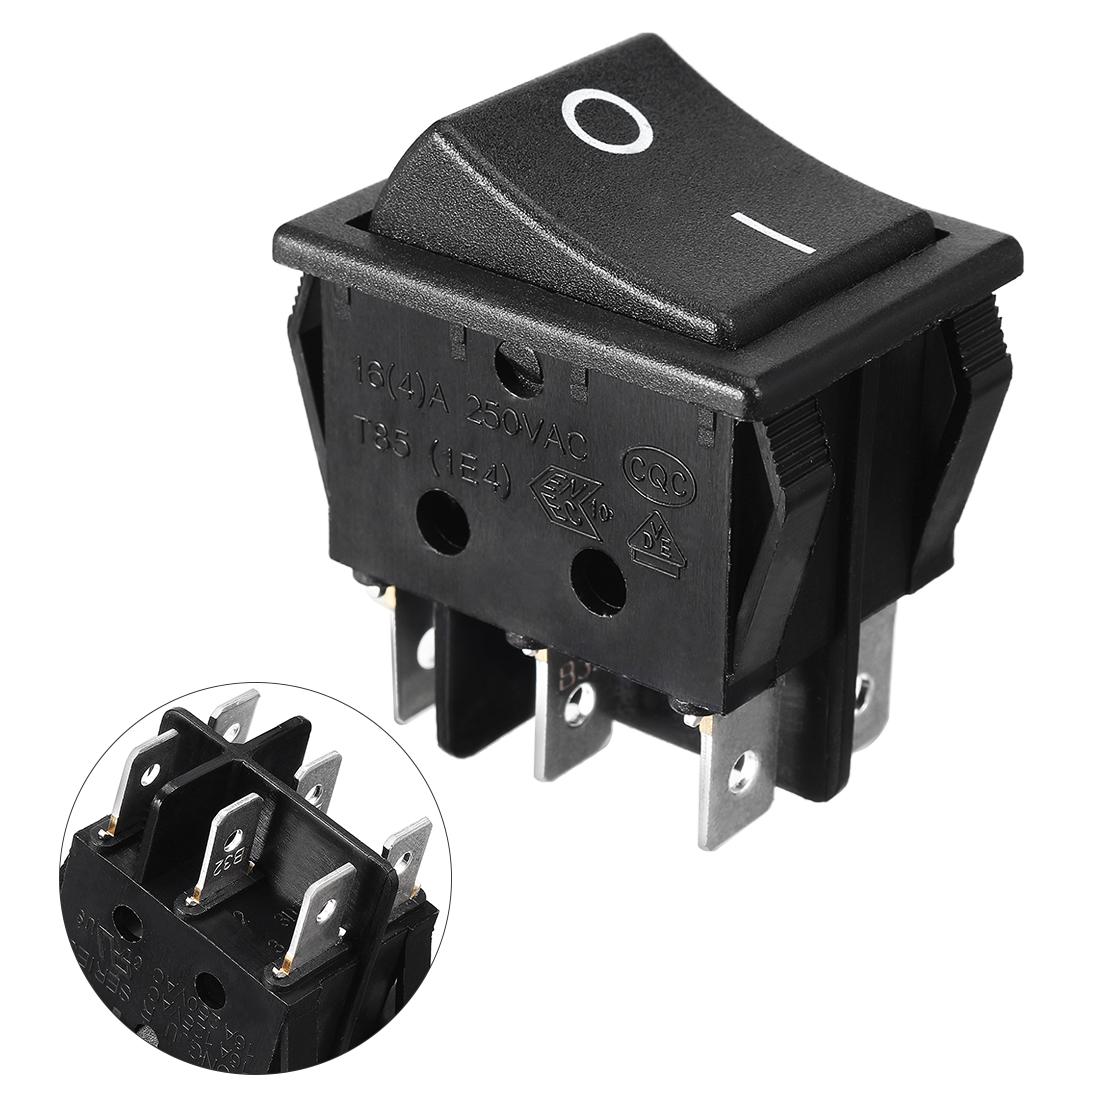 DPDT 2Position I/O 6 Pin 16A/250V AC Rocker Boat Switch Black